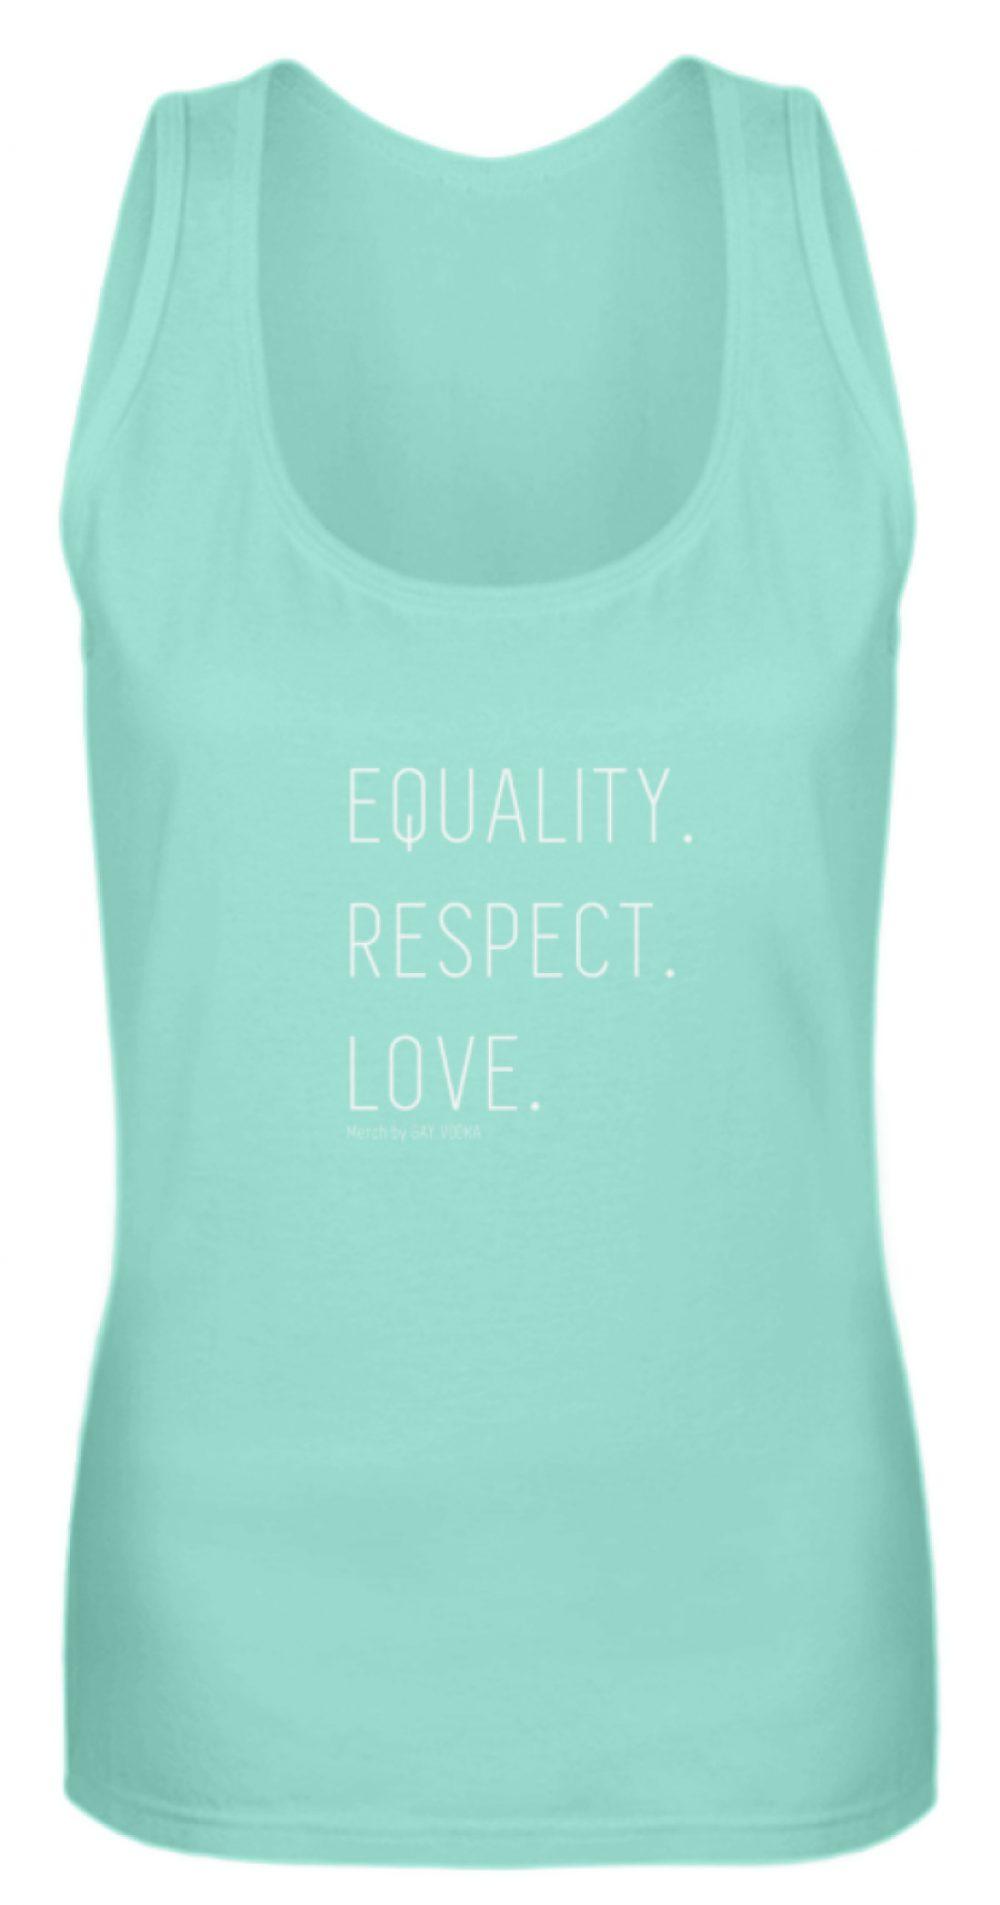 EQUALITY. RESPECT. LOVE. - Frauen Tanktop-657